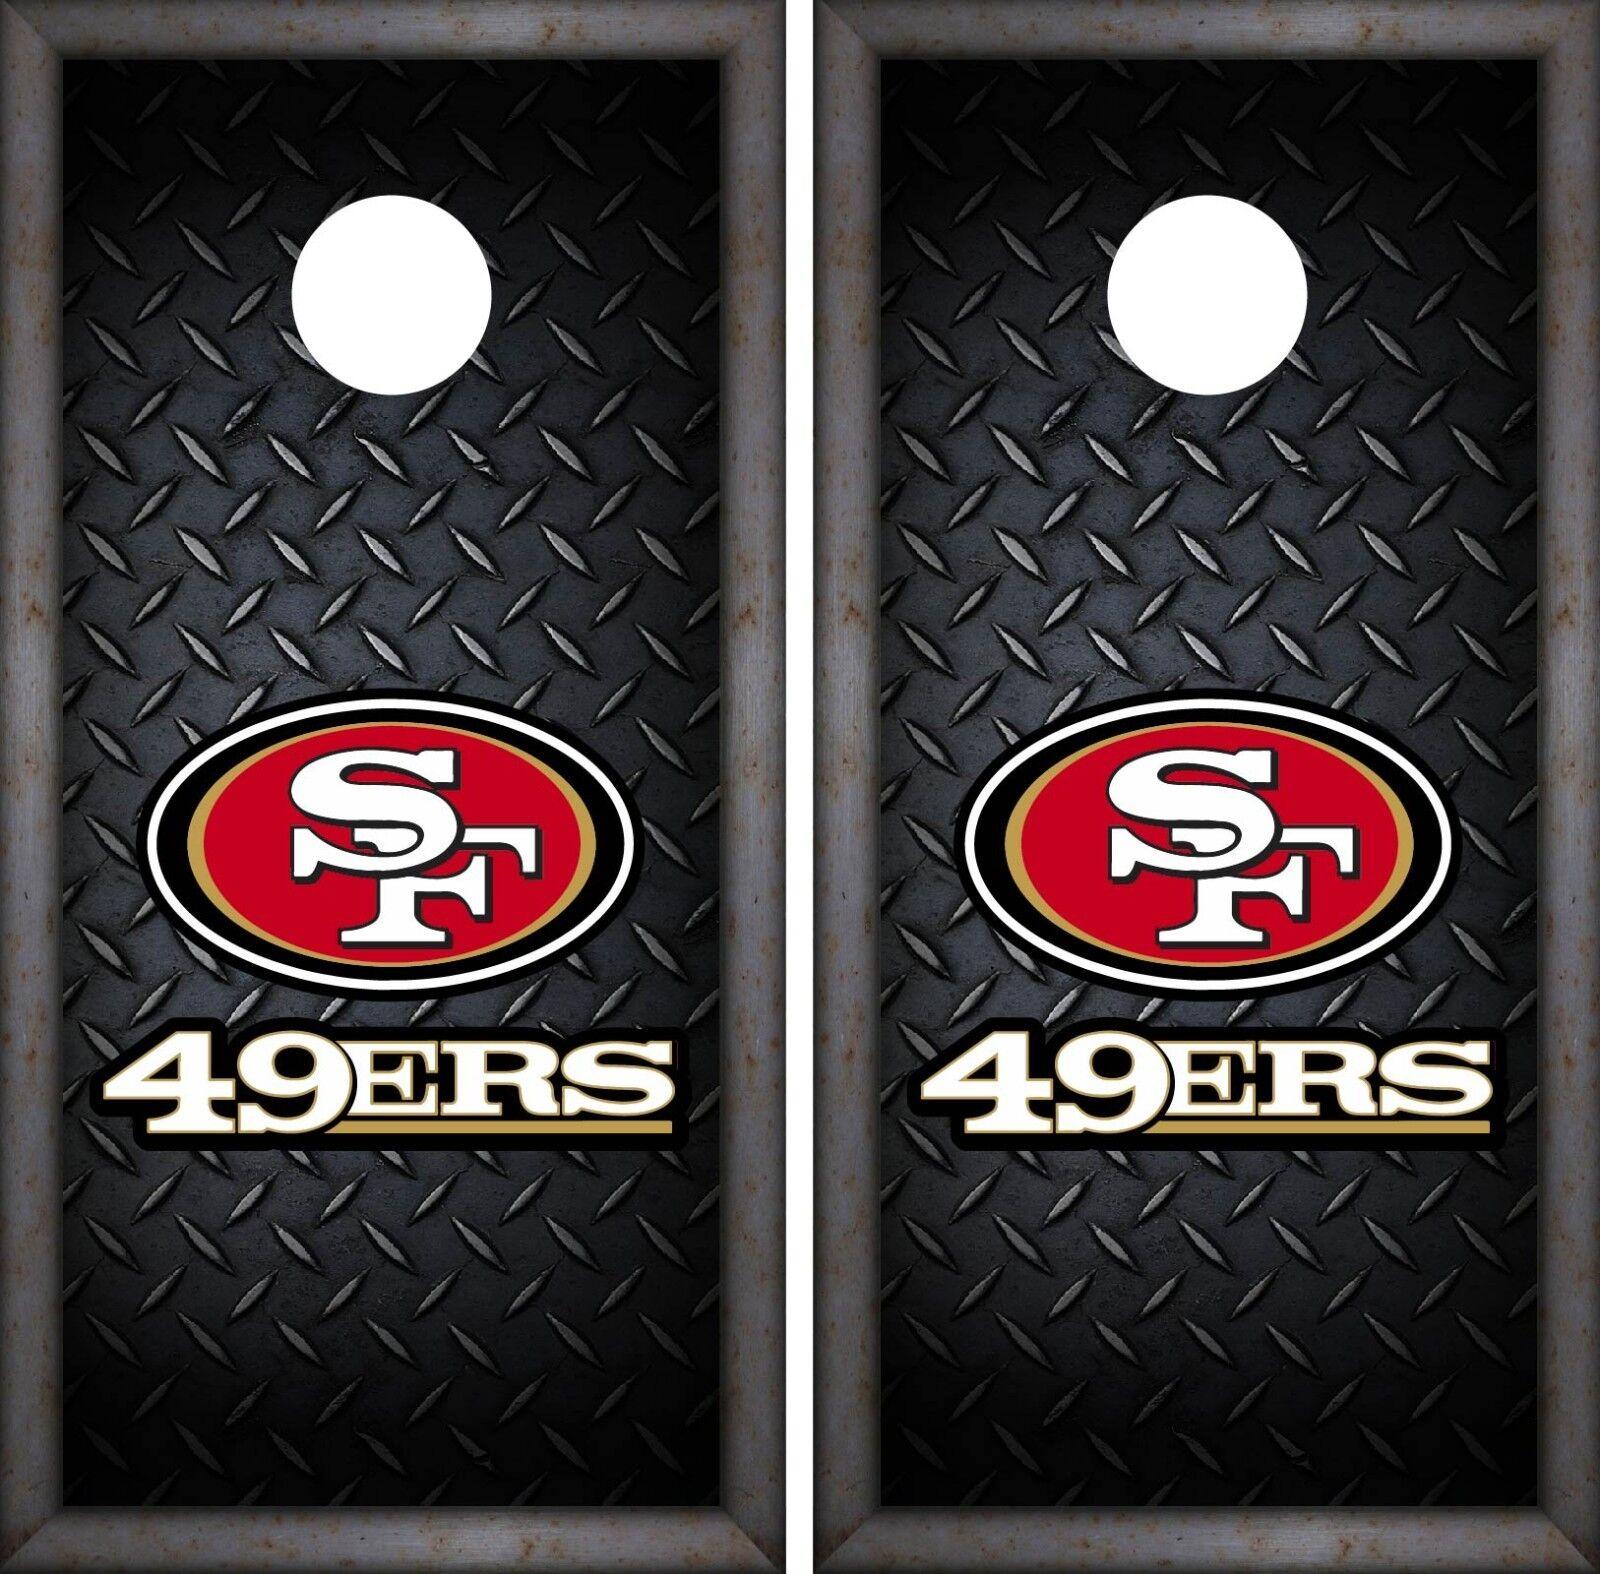 San  Francisco 49ERS Cornhole Luxury Wrap NFL Game Skin Board Set Vinyl Art CO114  selling well all over the world